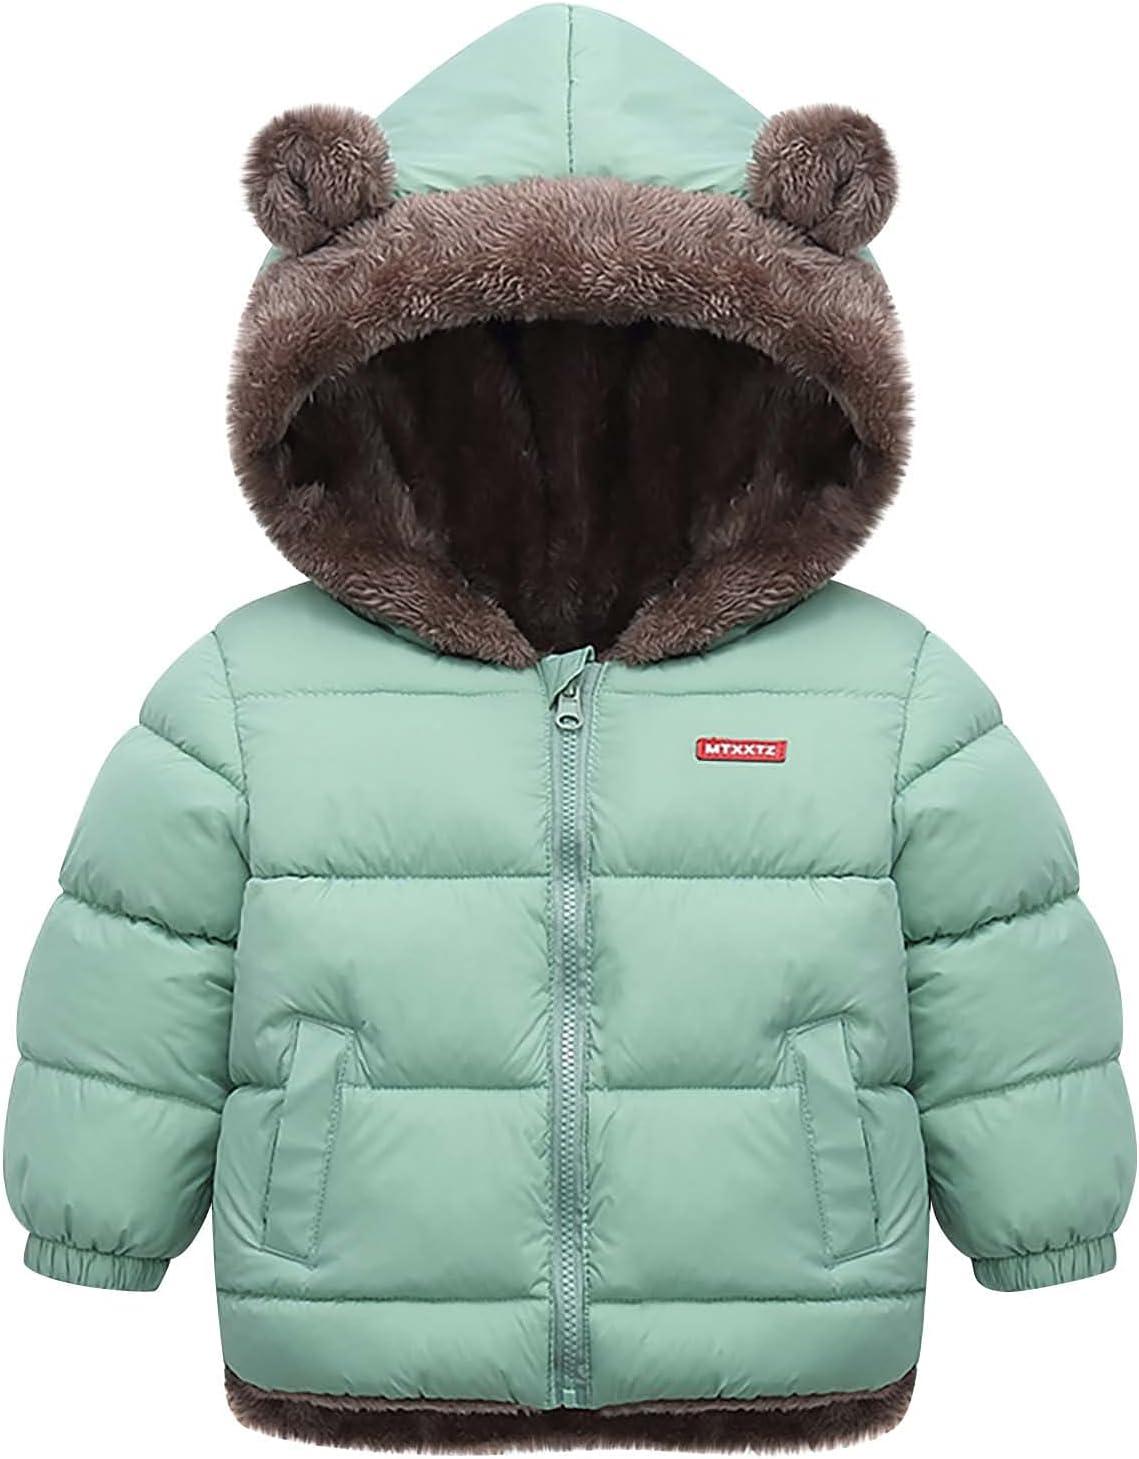 Ranking TOP9 Toddler Kids Winter Coat service Baby Boys Girl Hooded Ear J Bear Padded